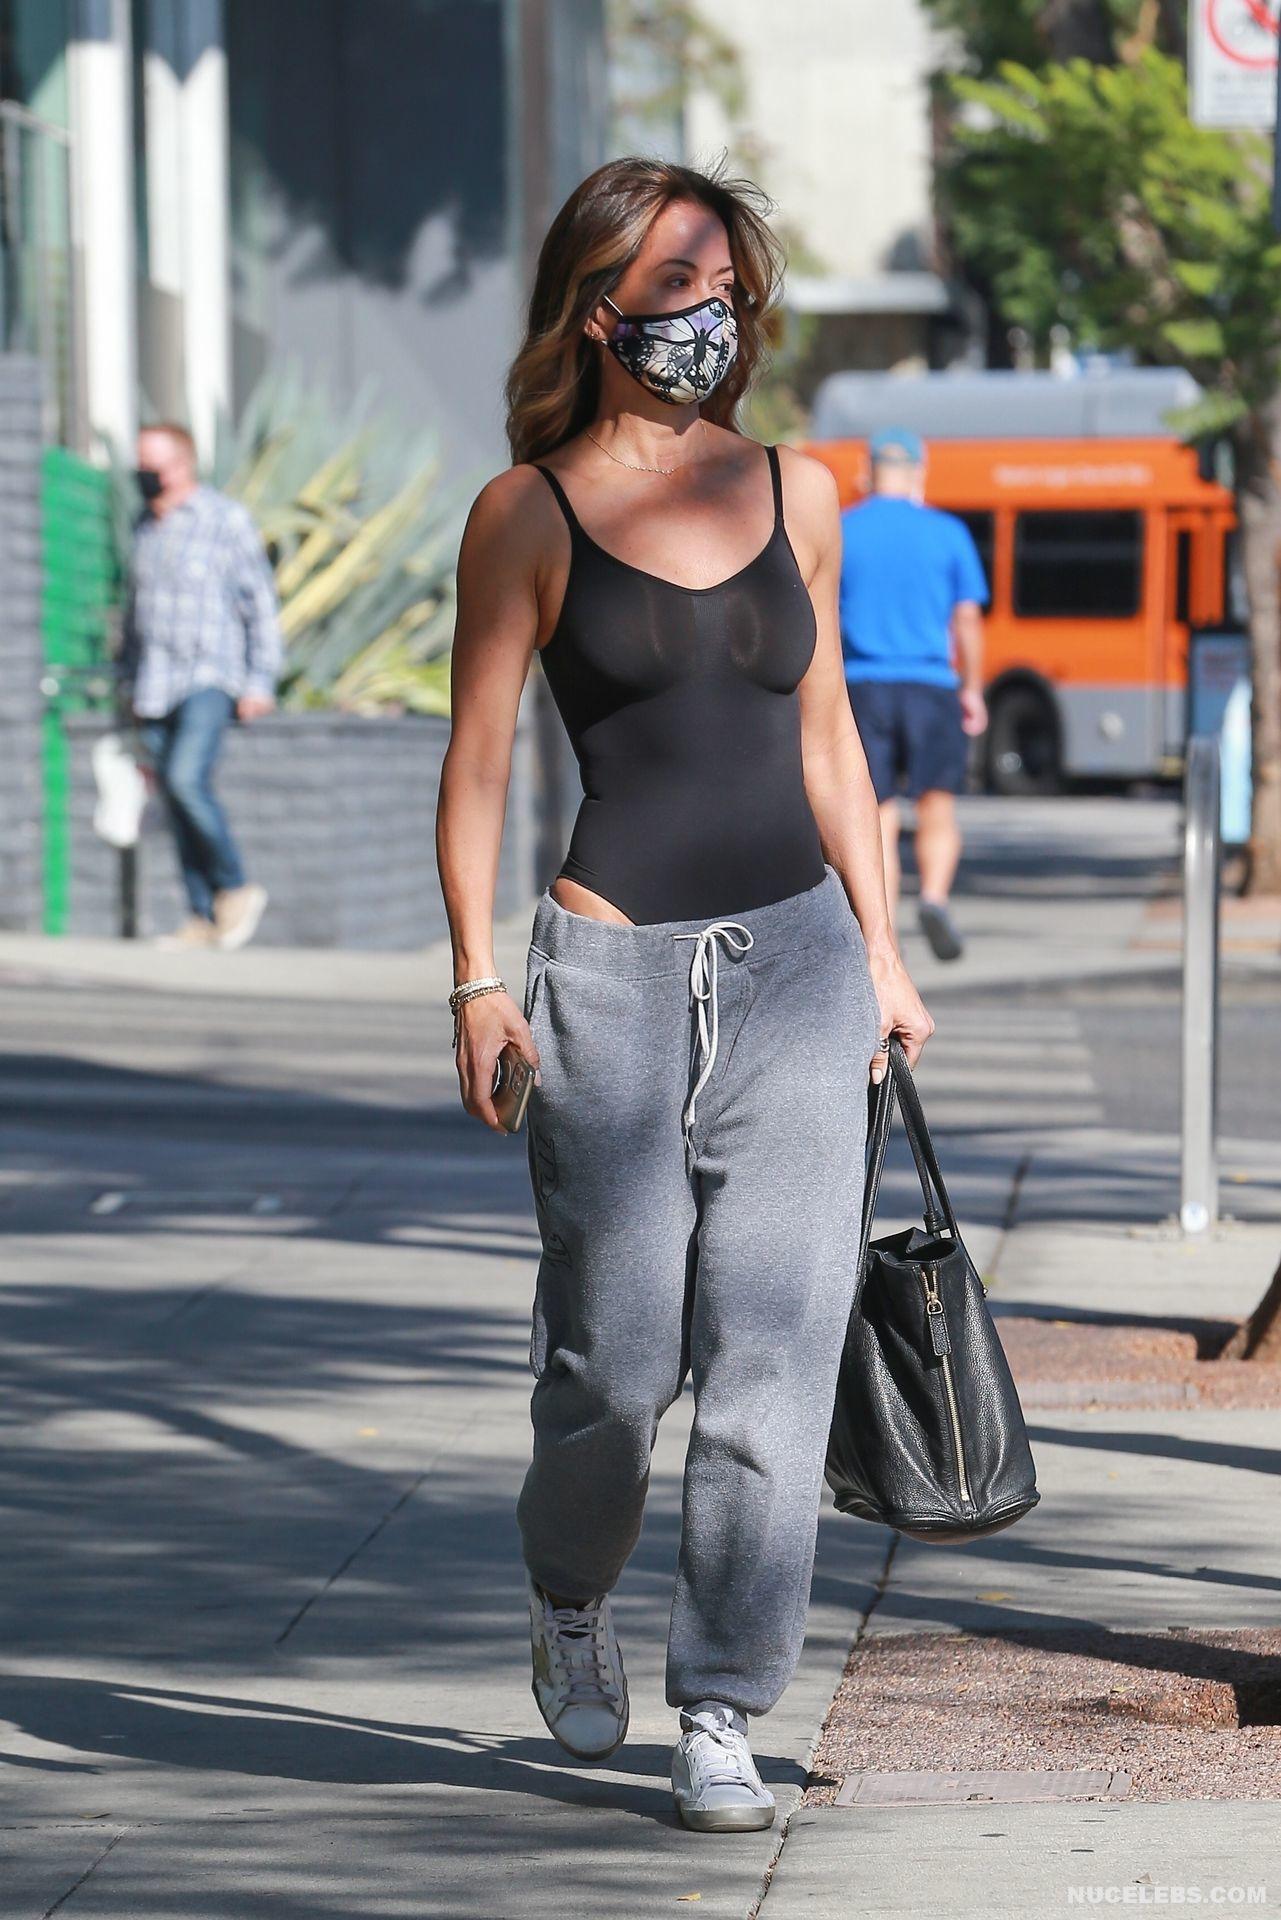 Brooke Burke Shows Her Gorgeous Tits Outdoors - NuCelebs.com